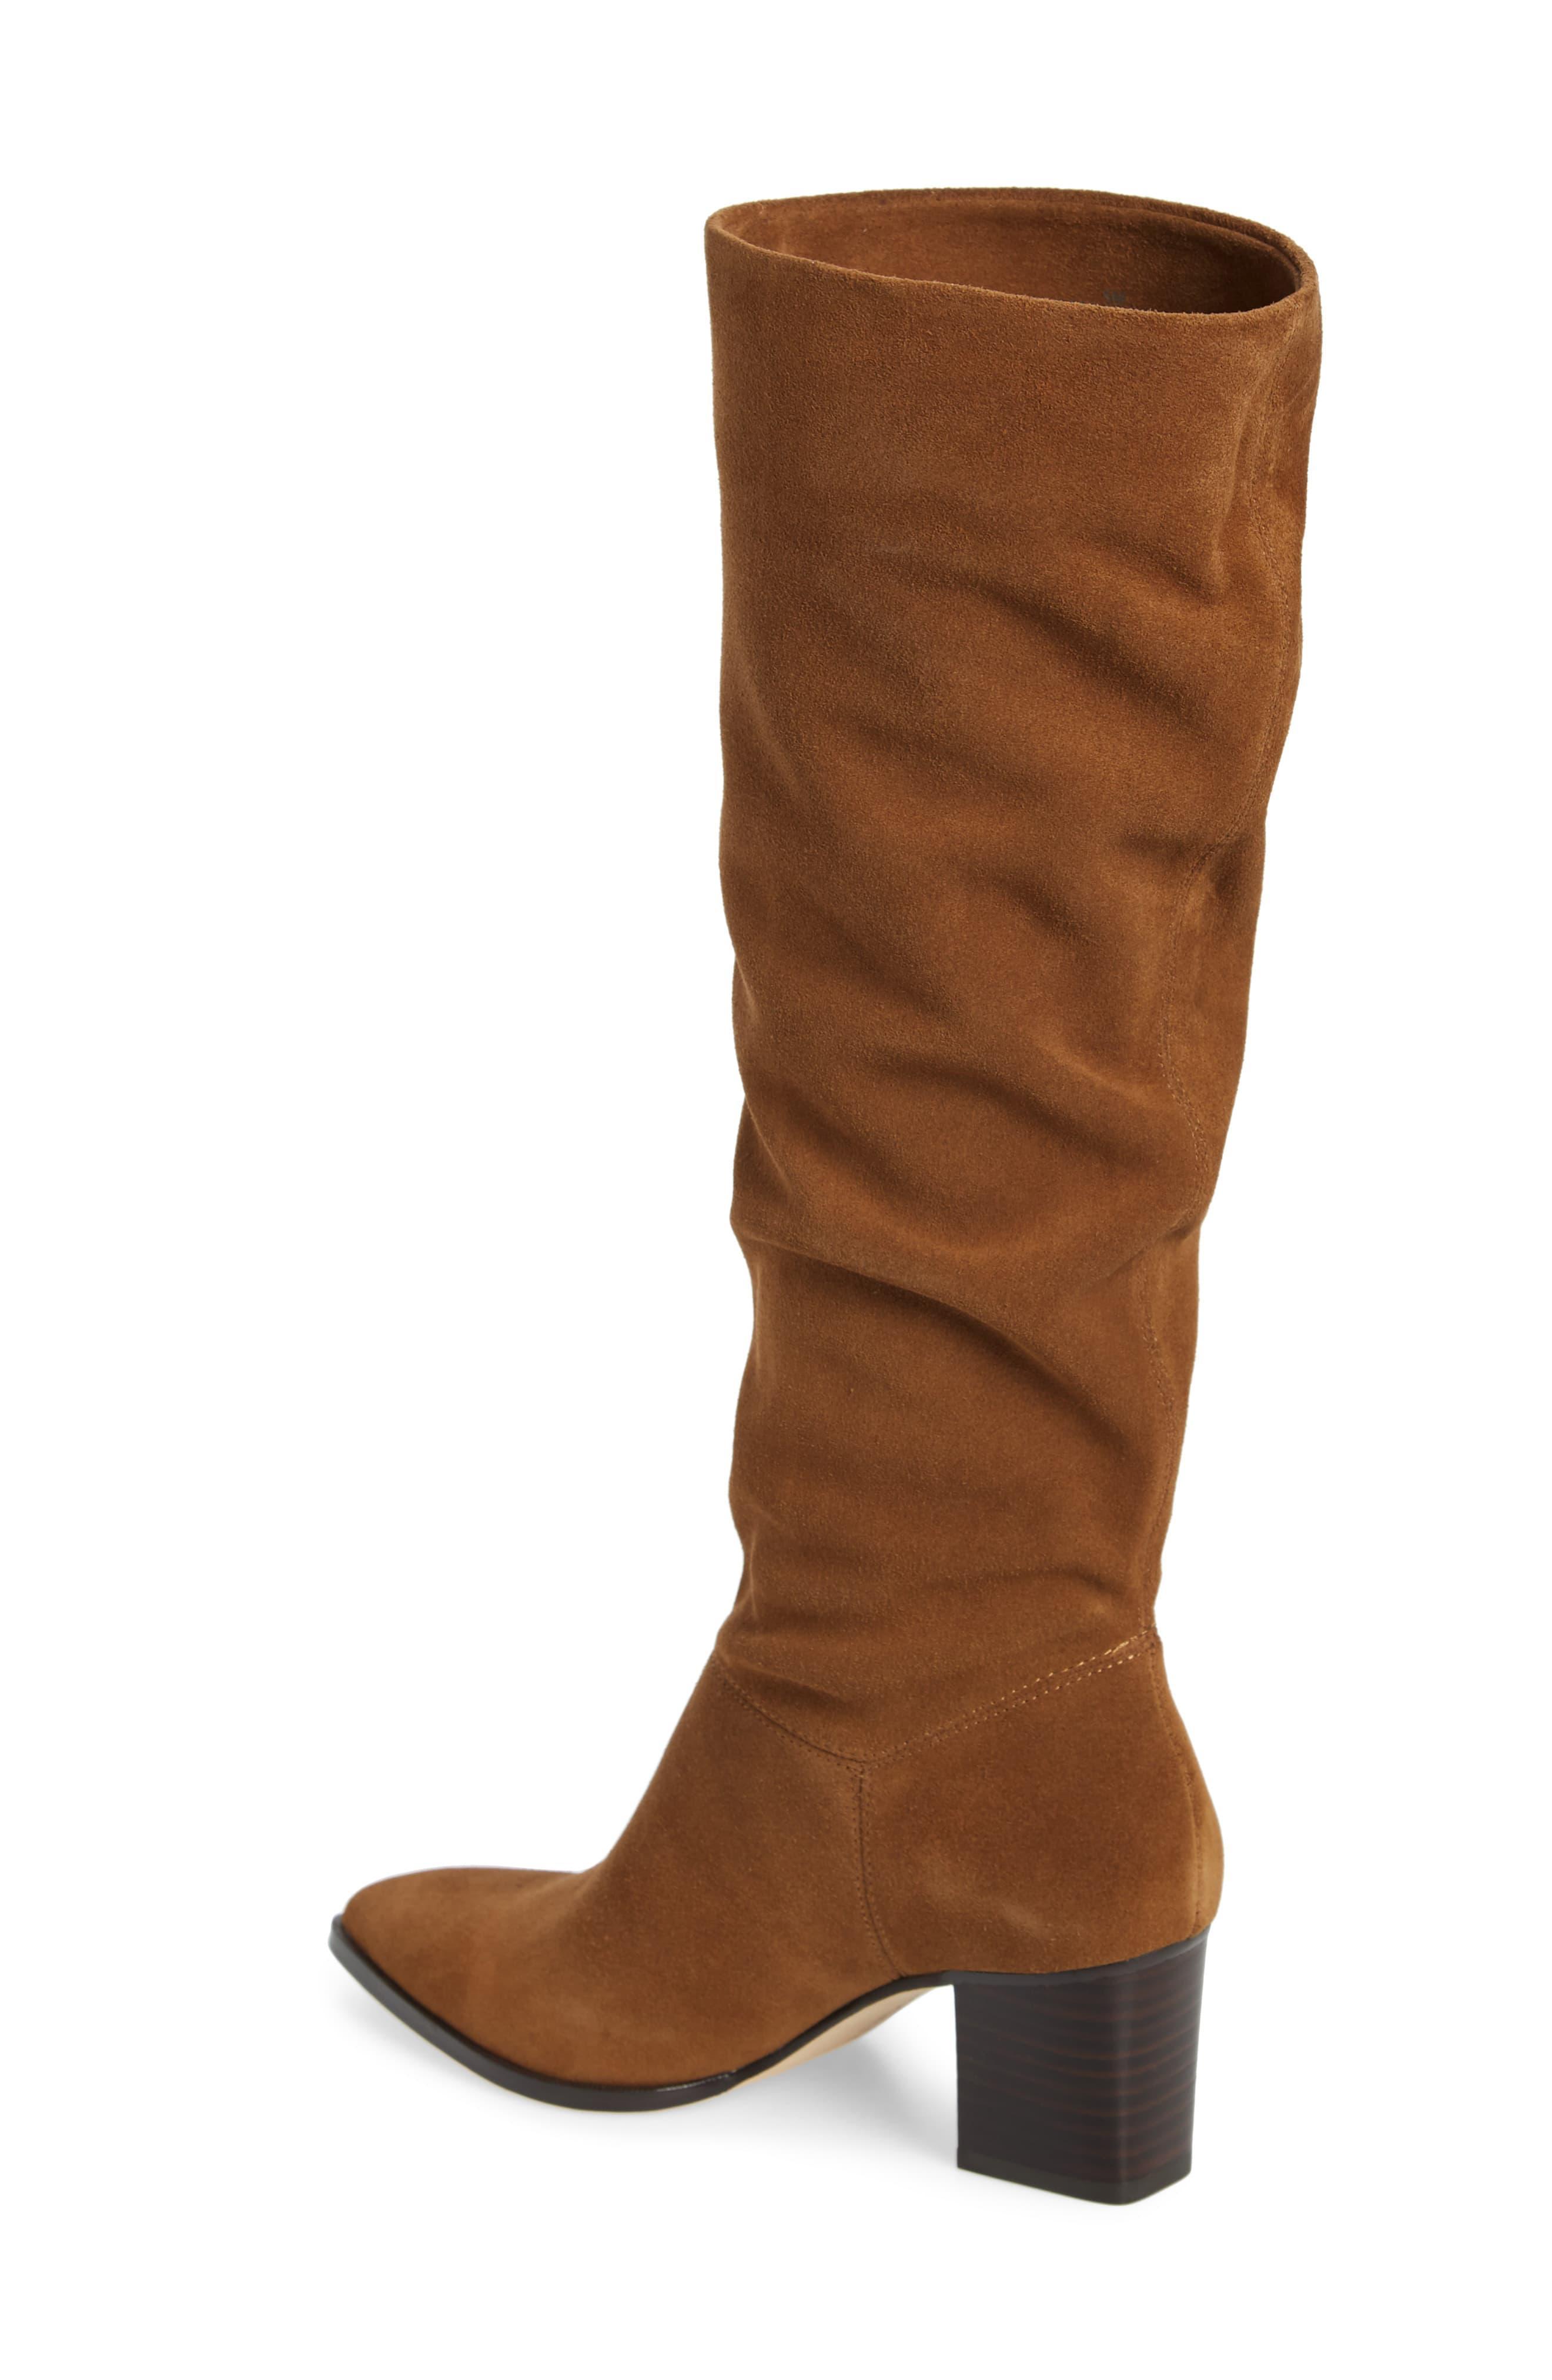 Sole Society Danilynn Knee High Boot in